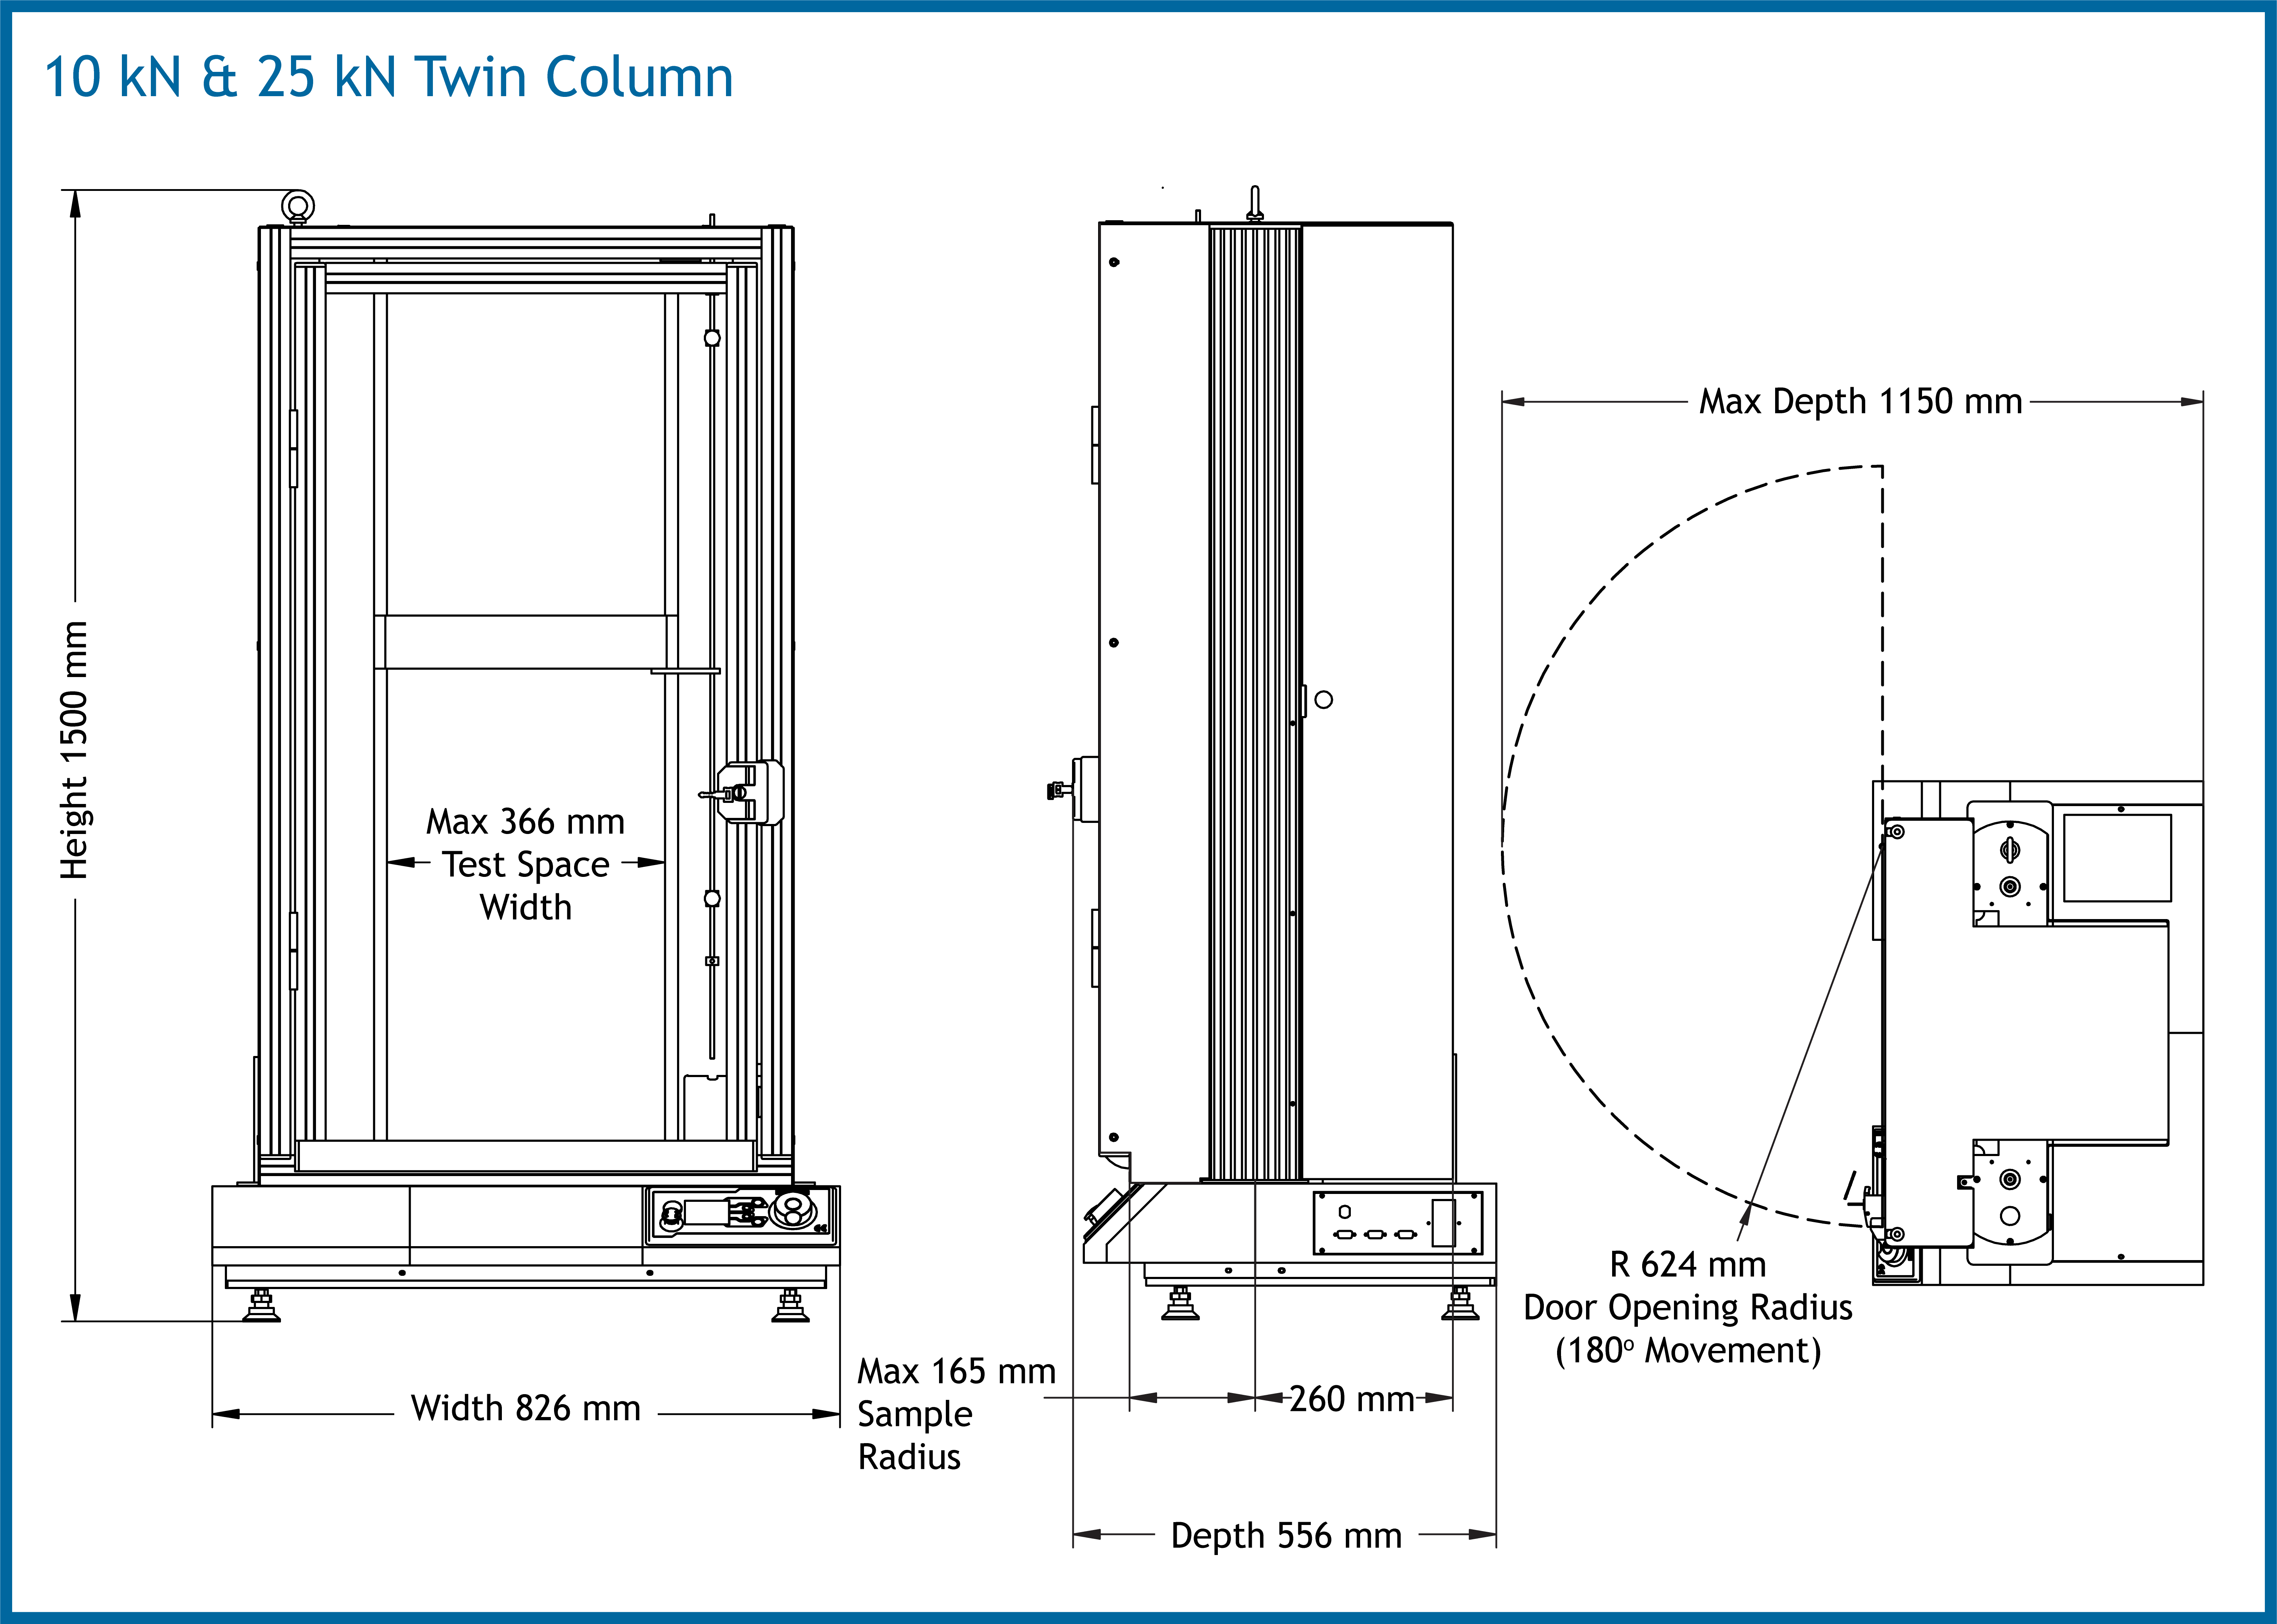 Twin Column 10-25 Dimensions